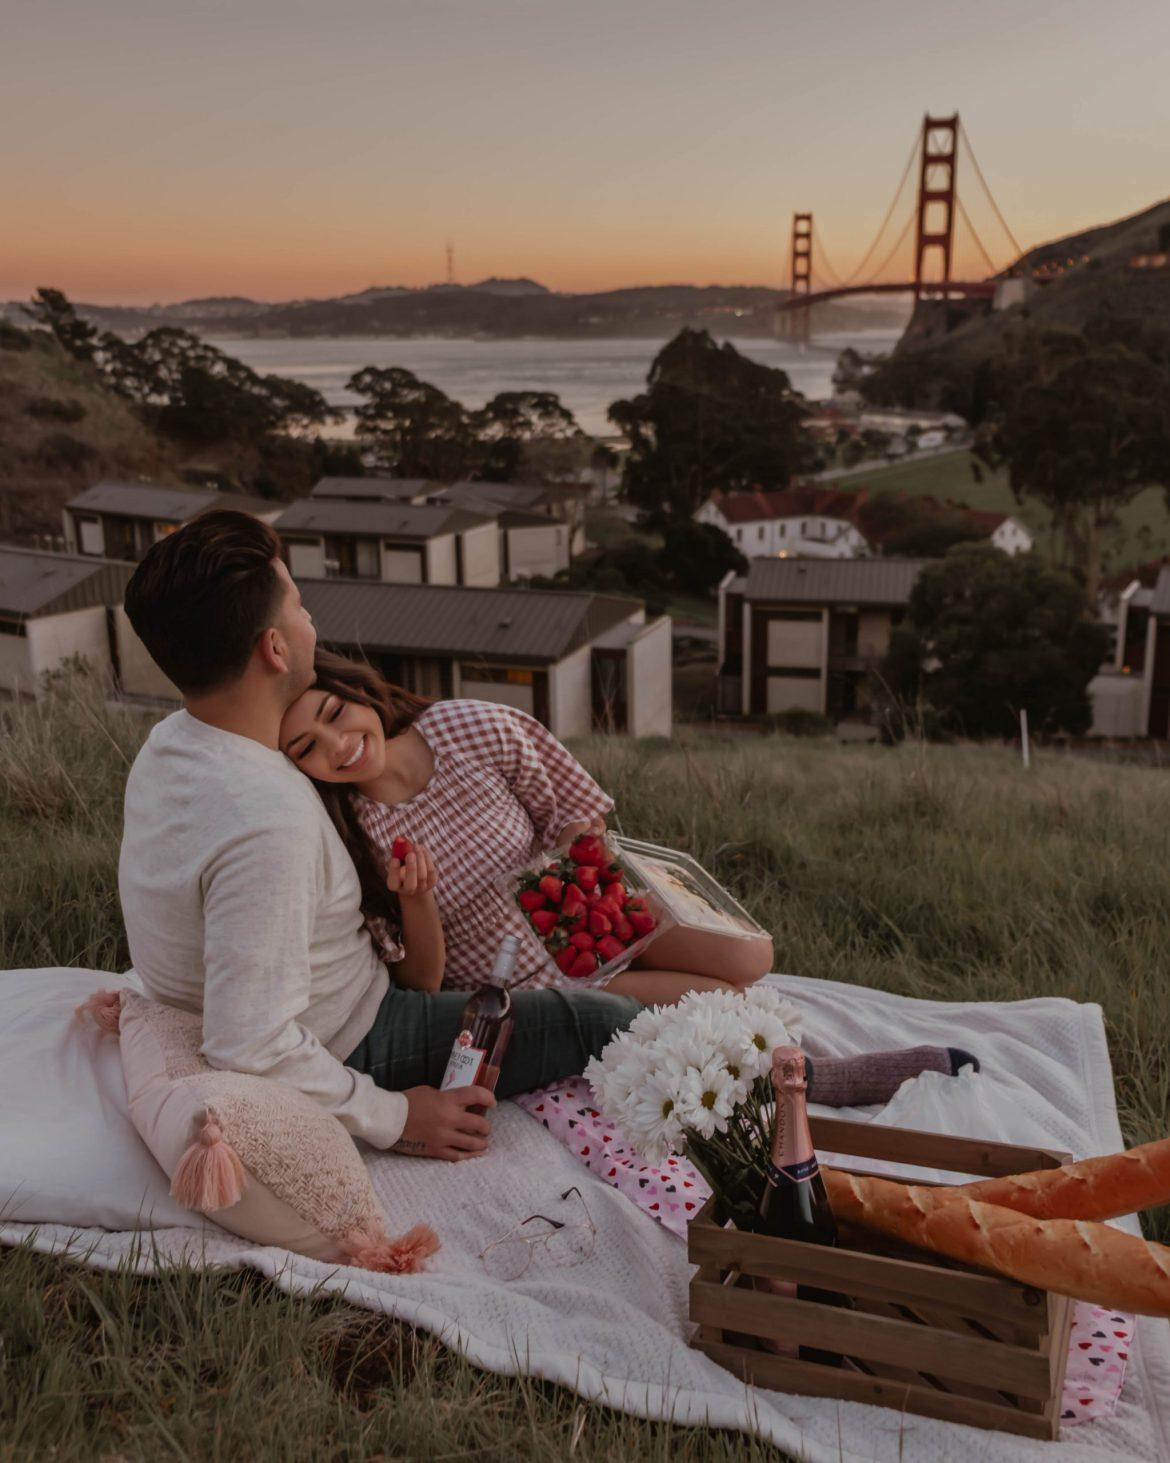 6 Epic Day Trips From San Francisco - San Francisco photography, San Francisco engagement photos